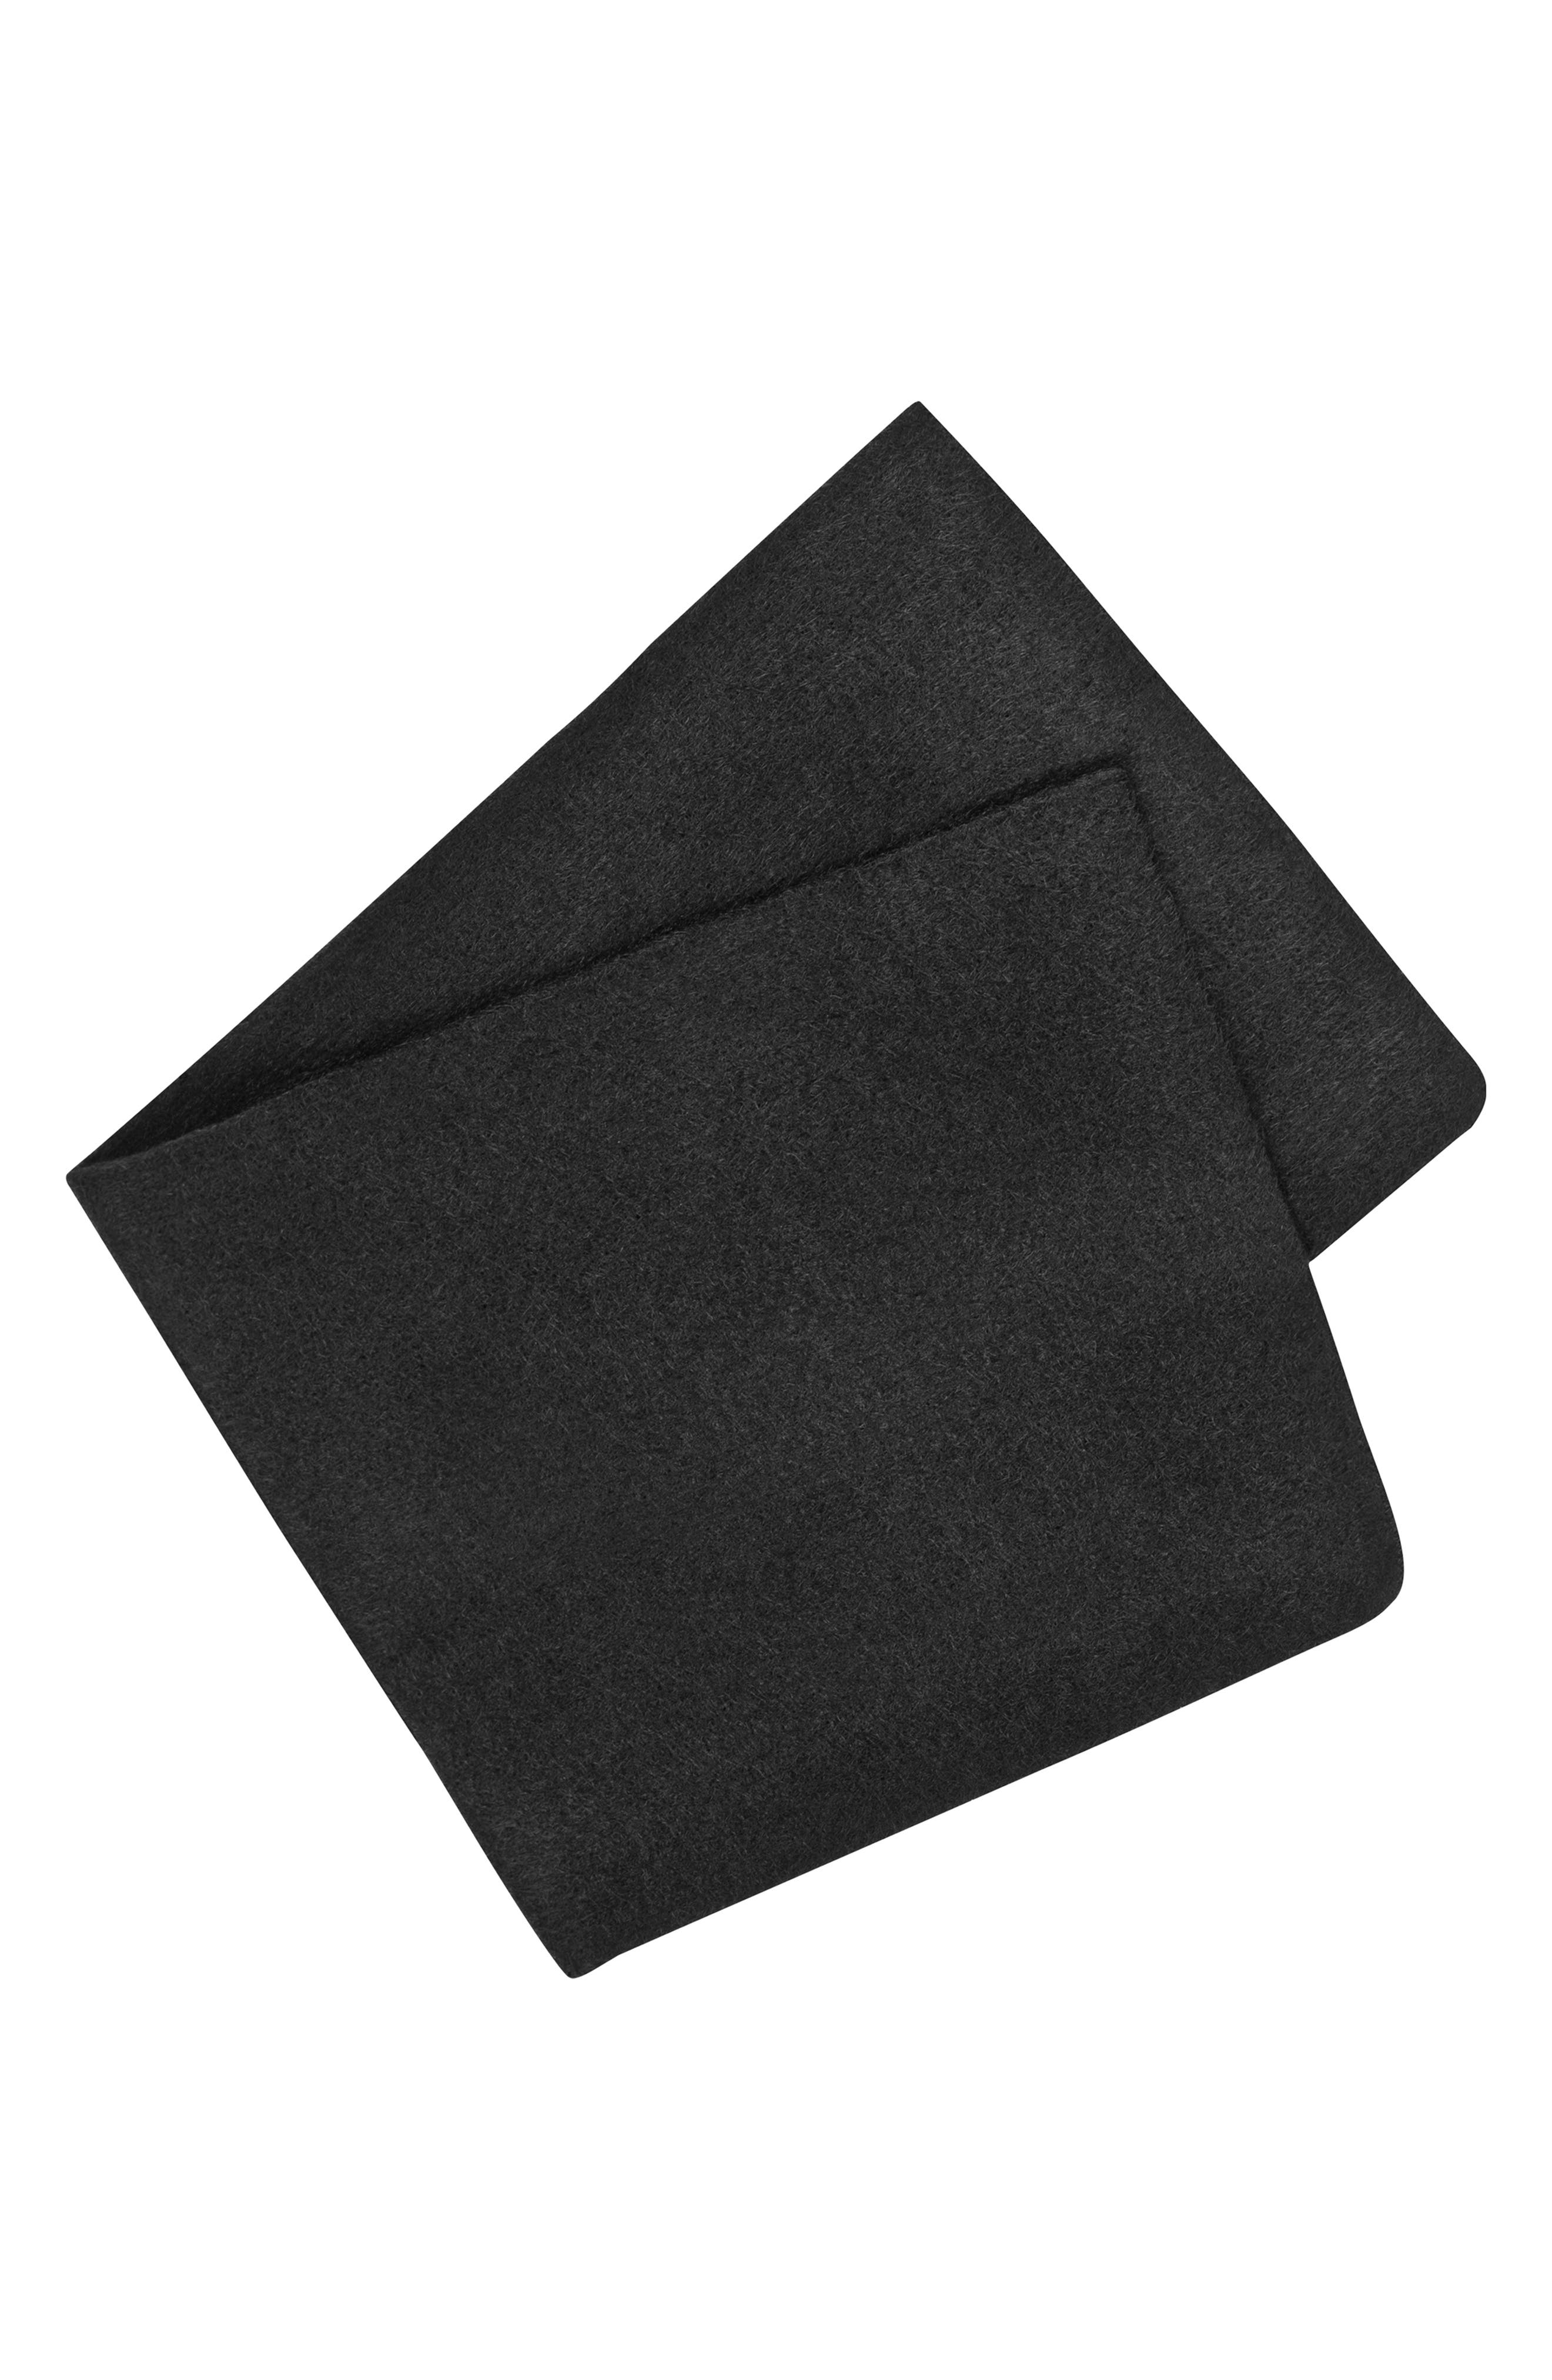 Black Charcoal Cleansing Cloths,                             Alternate thumbnail 2, color,                             NO COLOR